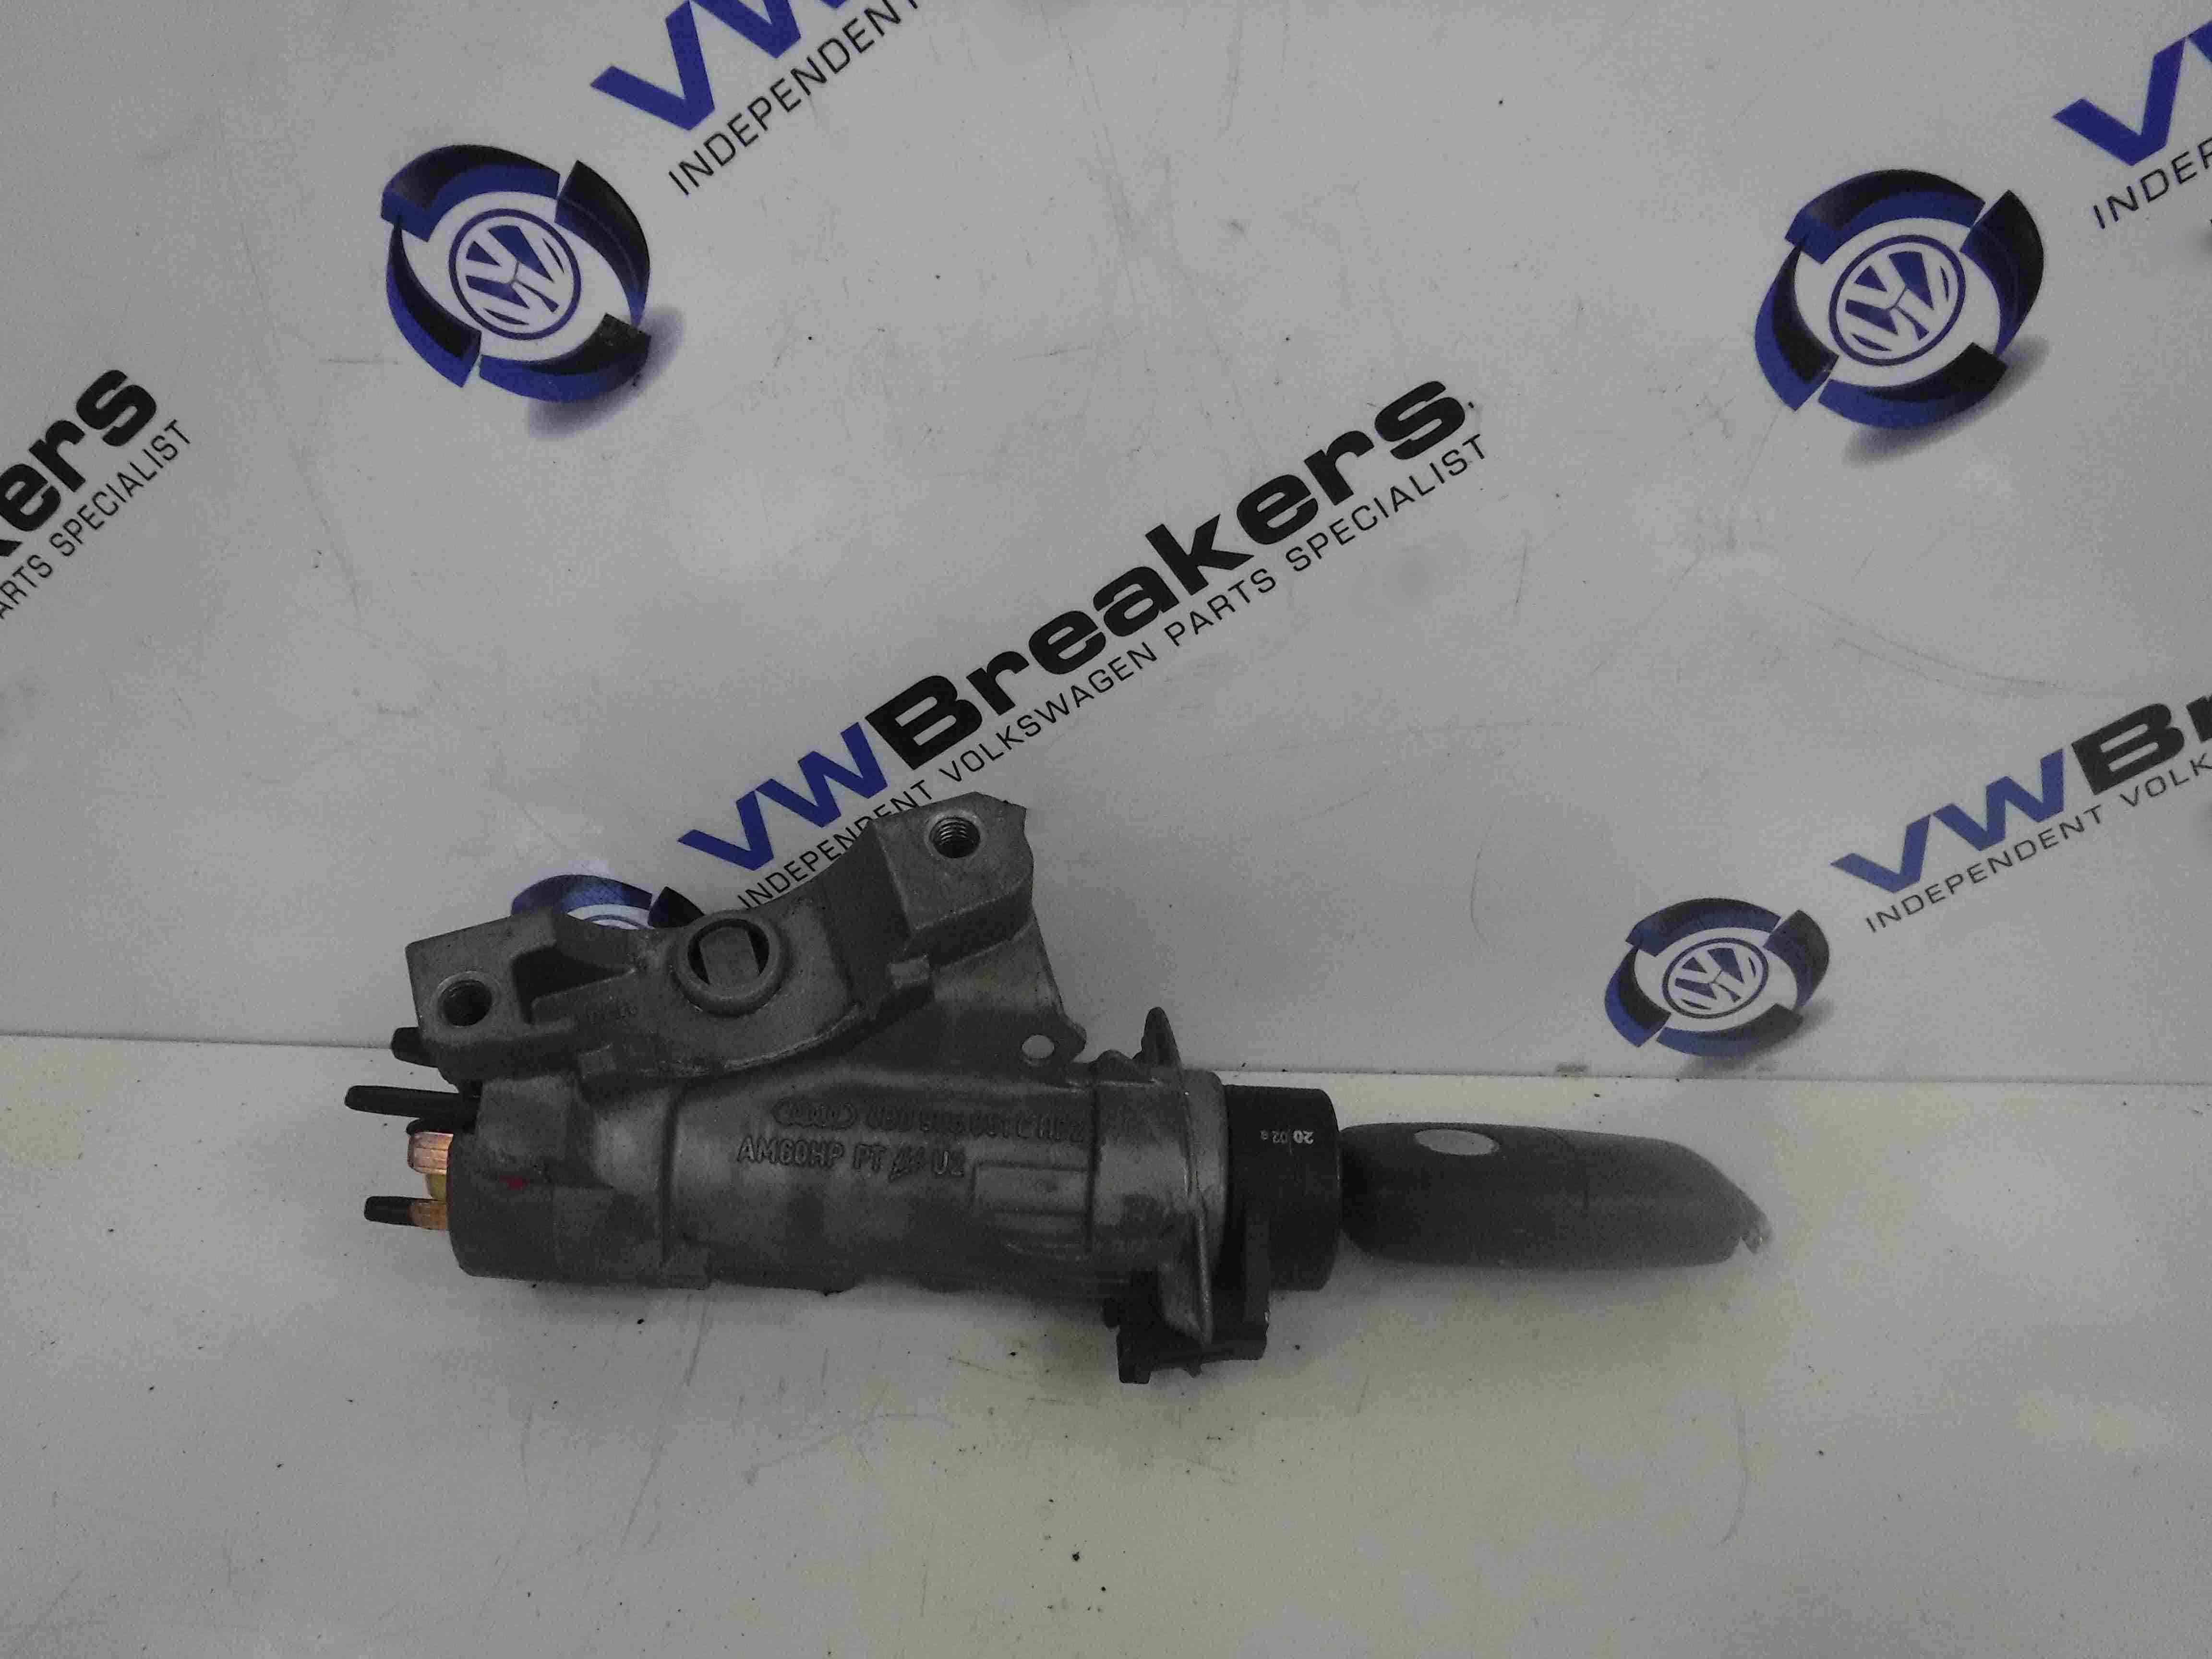 Volkswagen Polo 2003-2006 9N Ignition Barrel + Key 4B0905851C